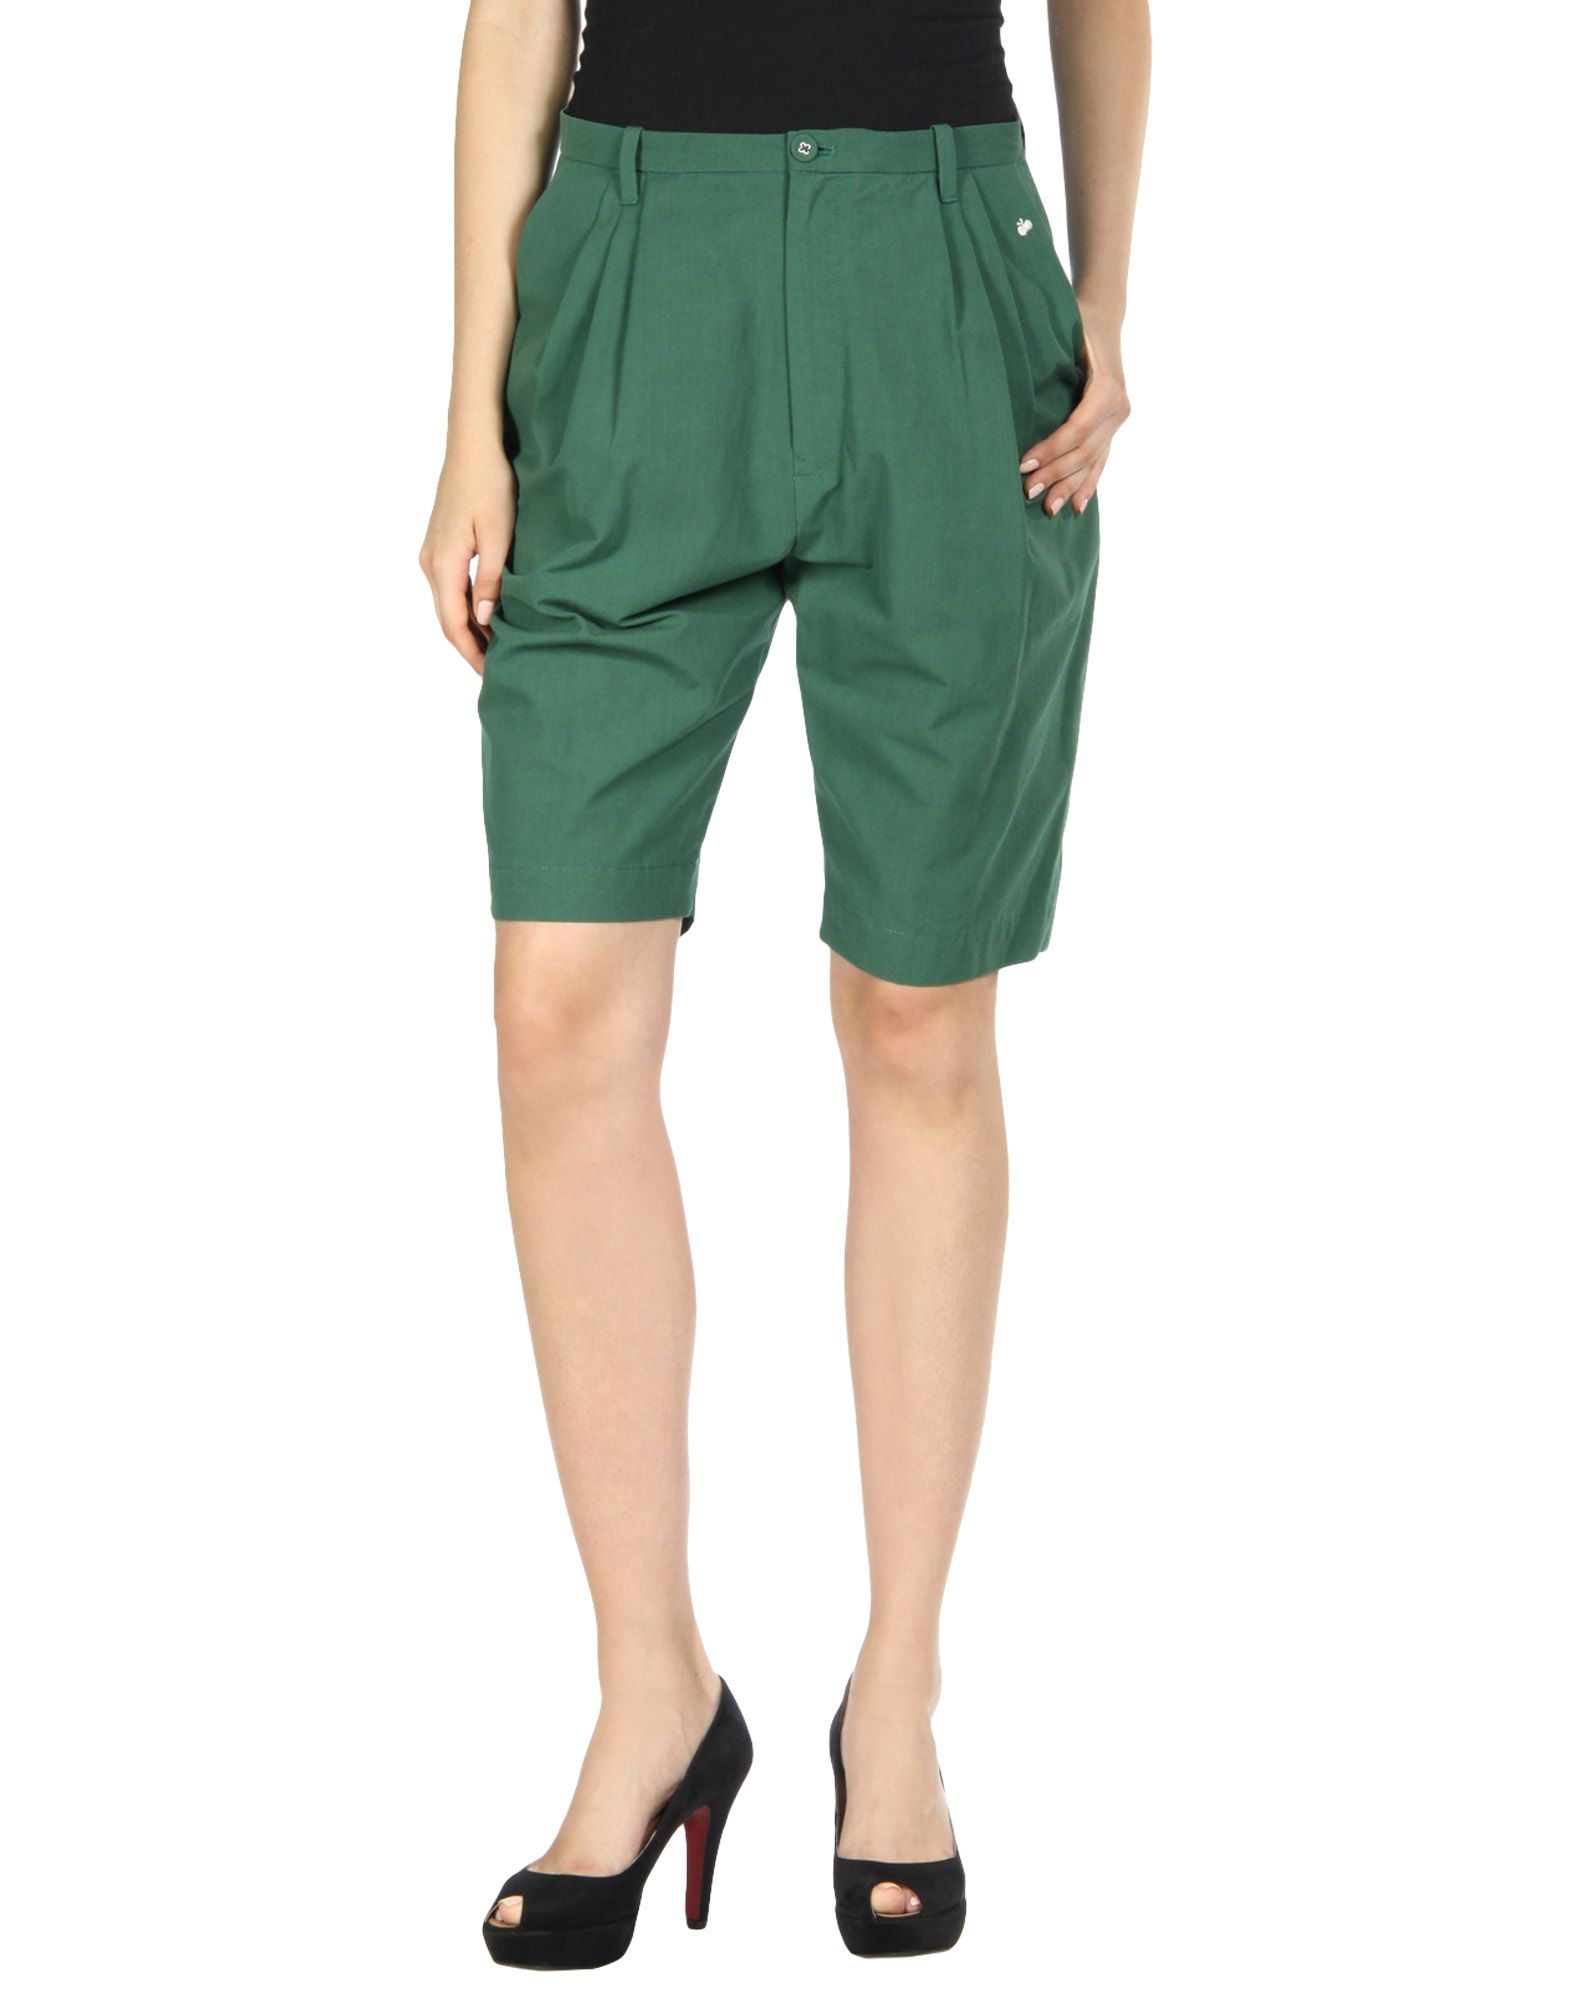 MINÄ PERHONEN Shorts & Bermuda in Green